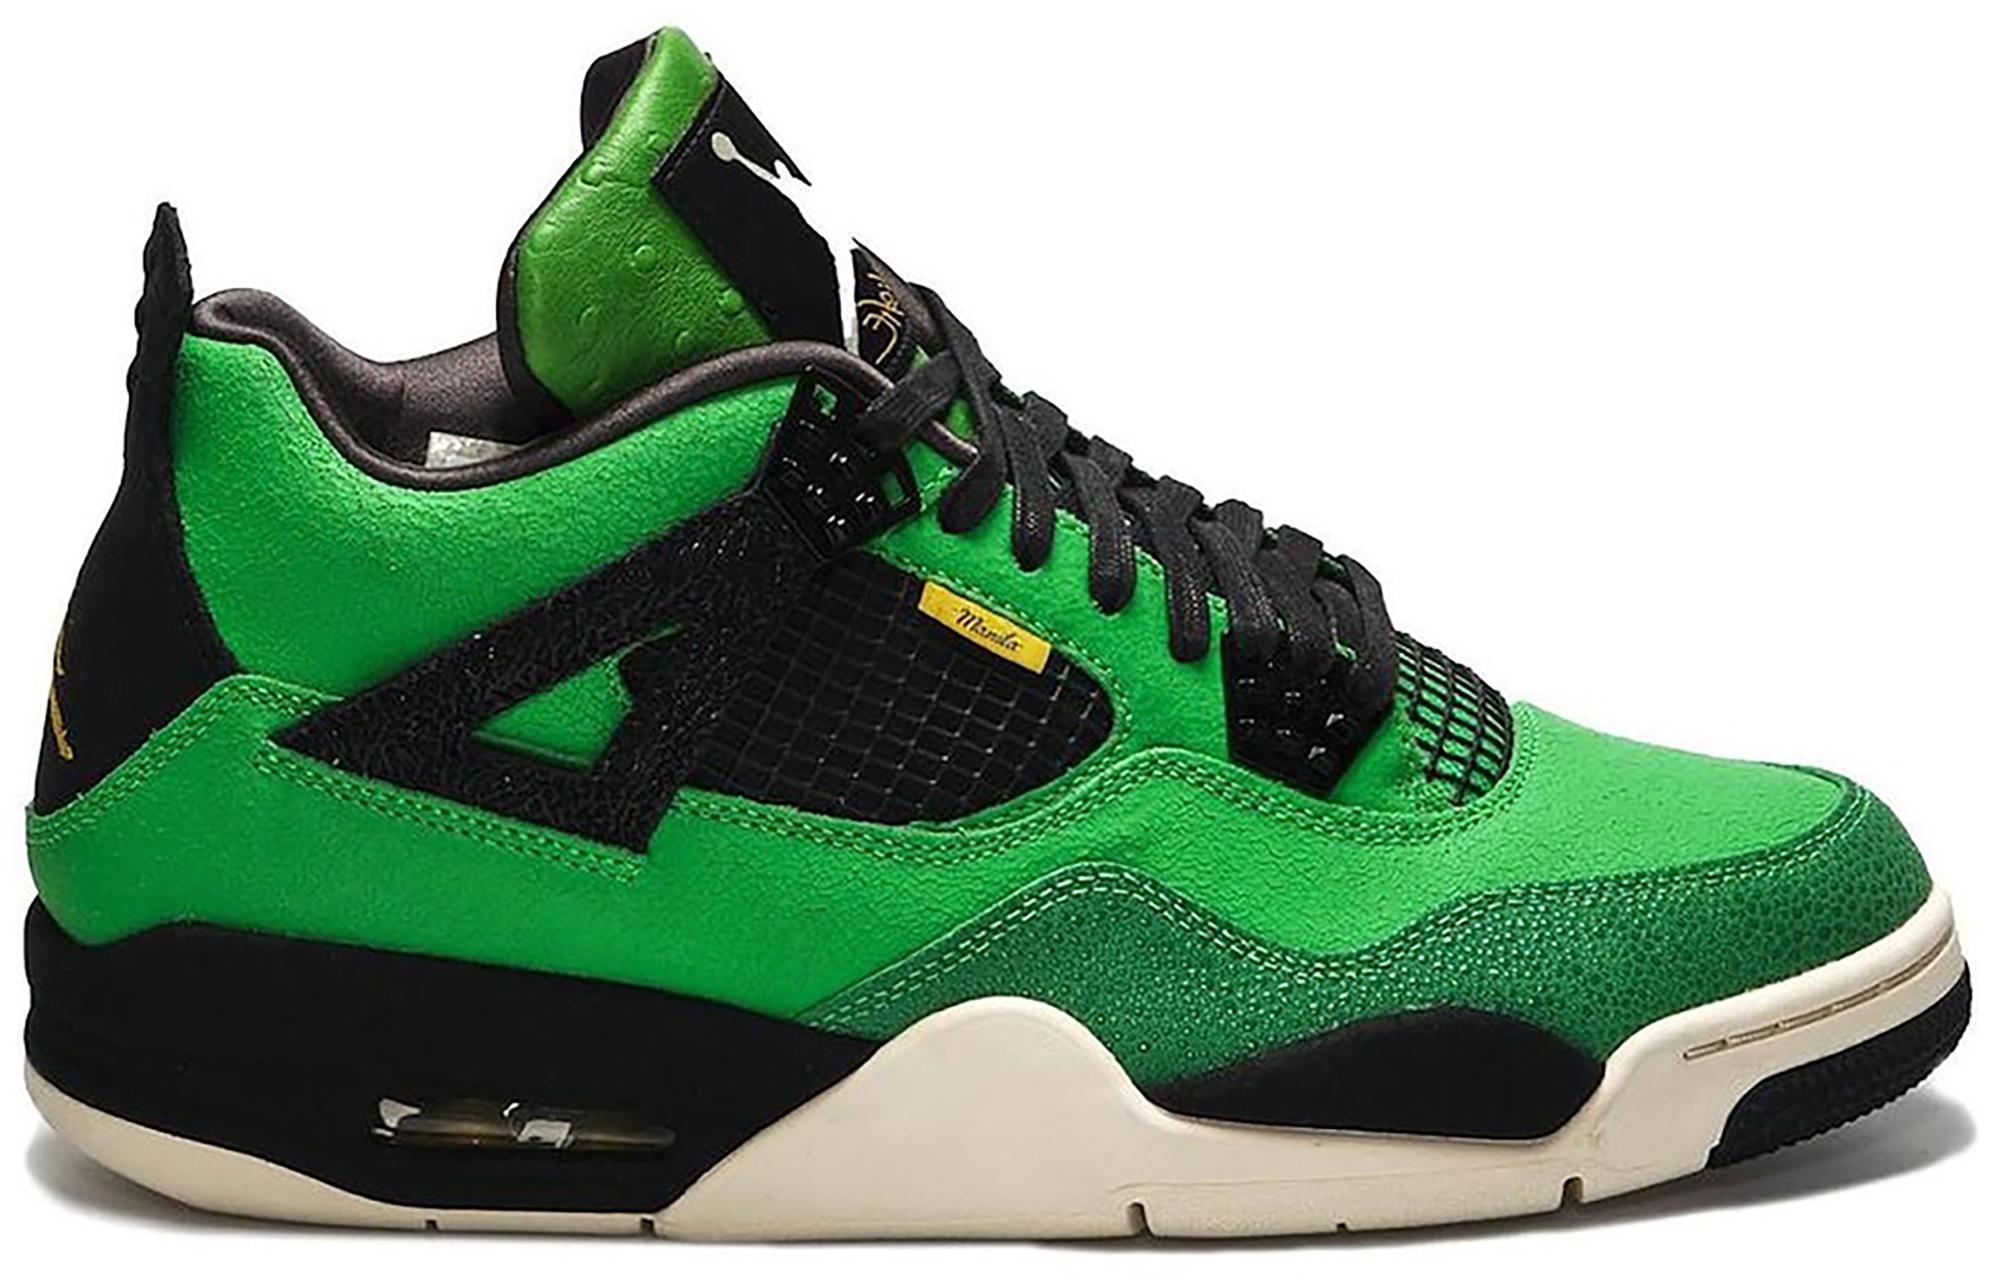 Jordan 4 Retro Manila - Sneakers